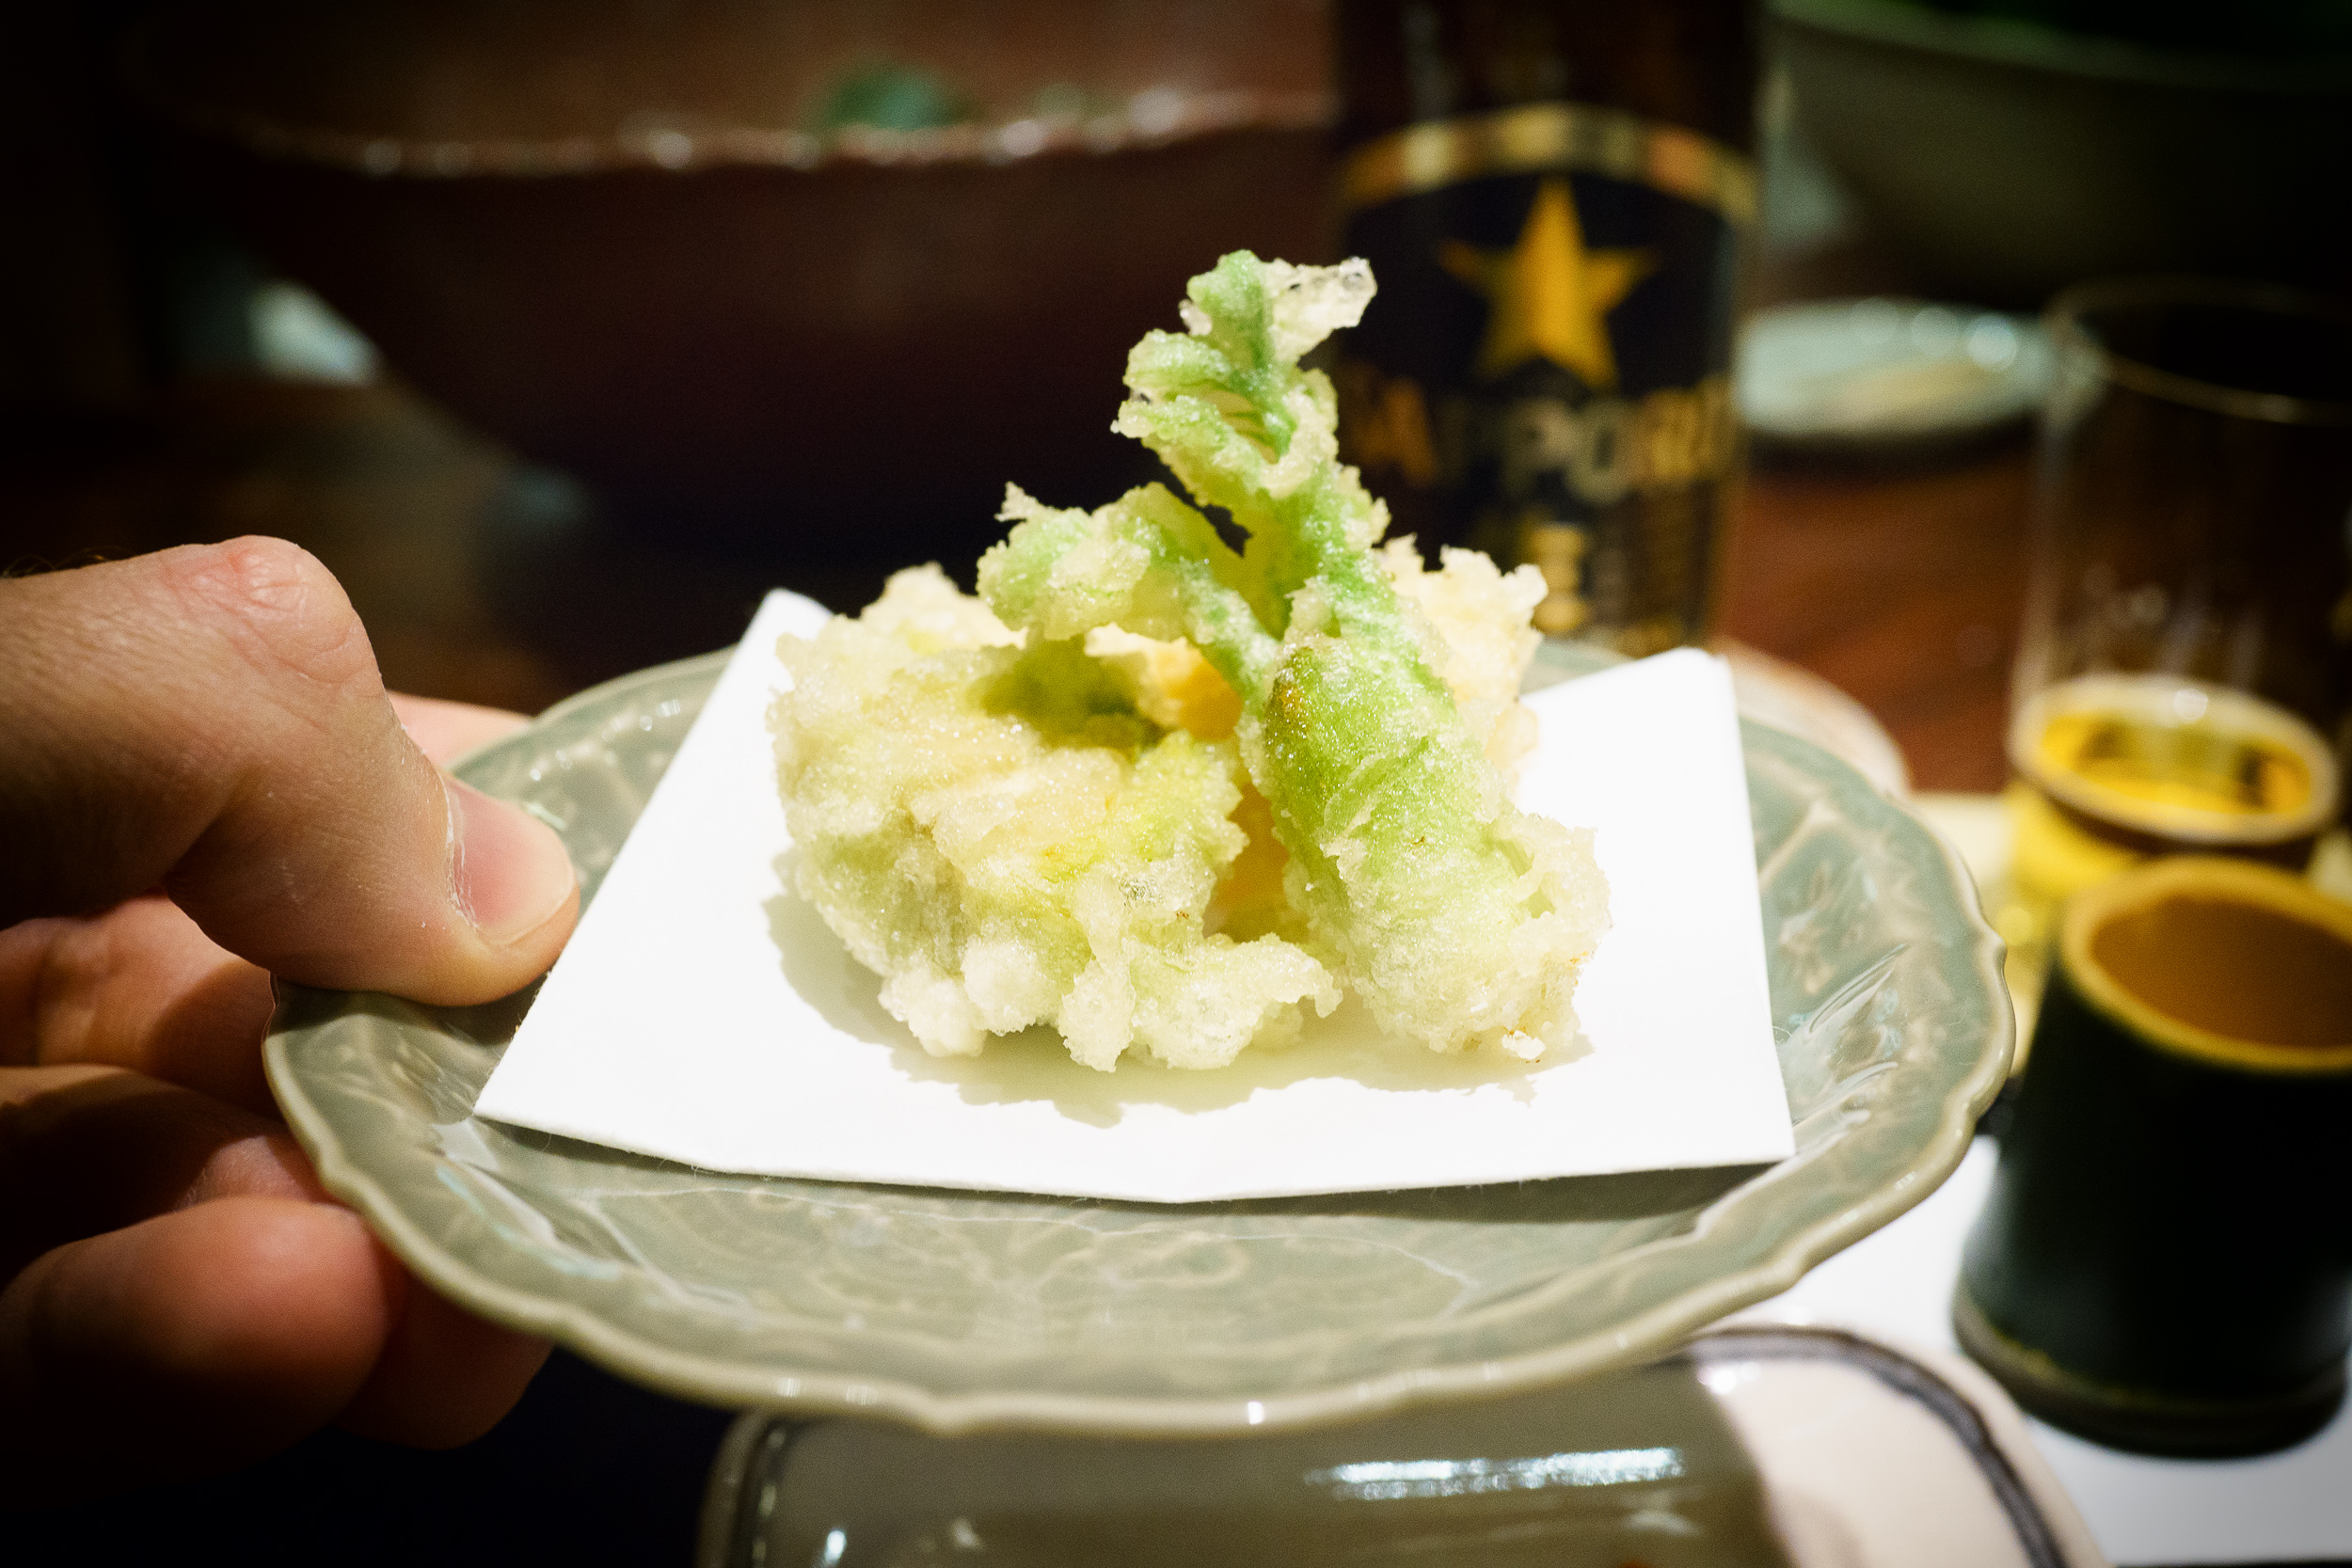 4th Course: Bitter greens tempura